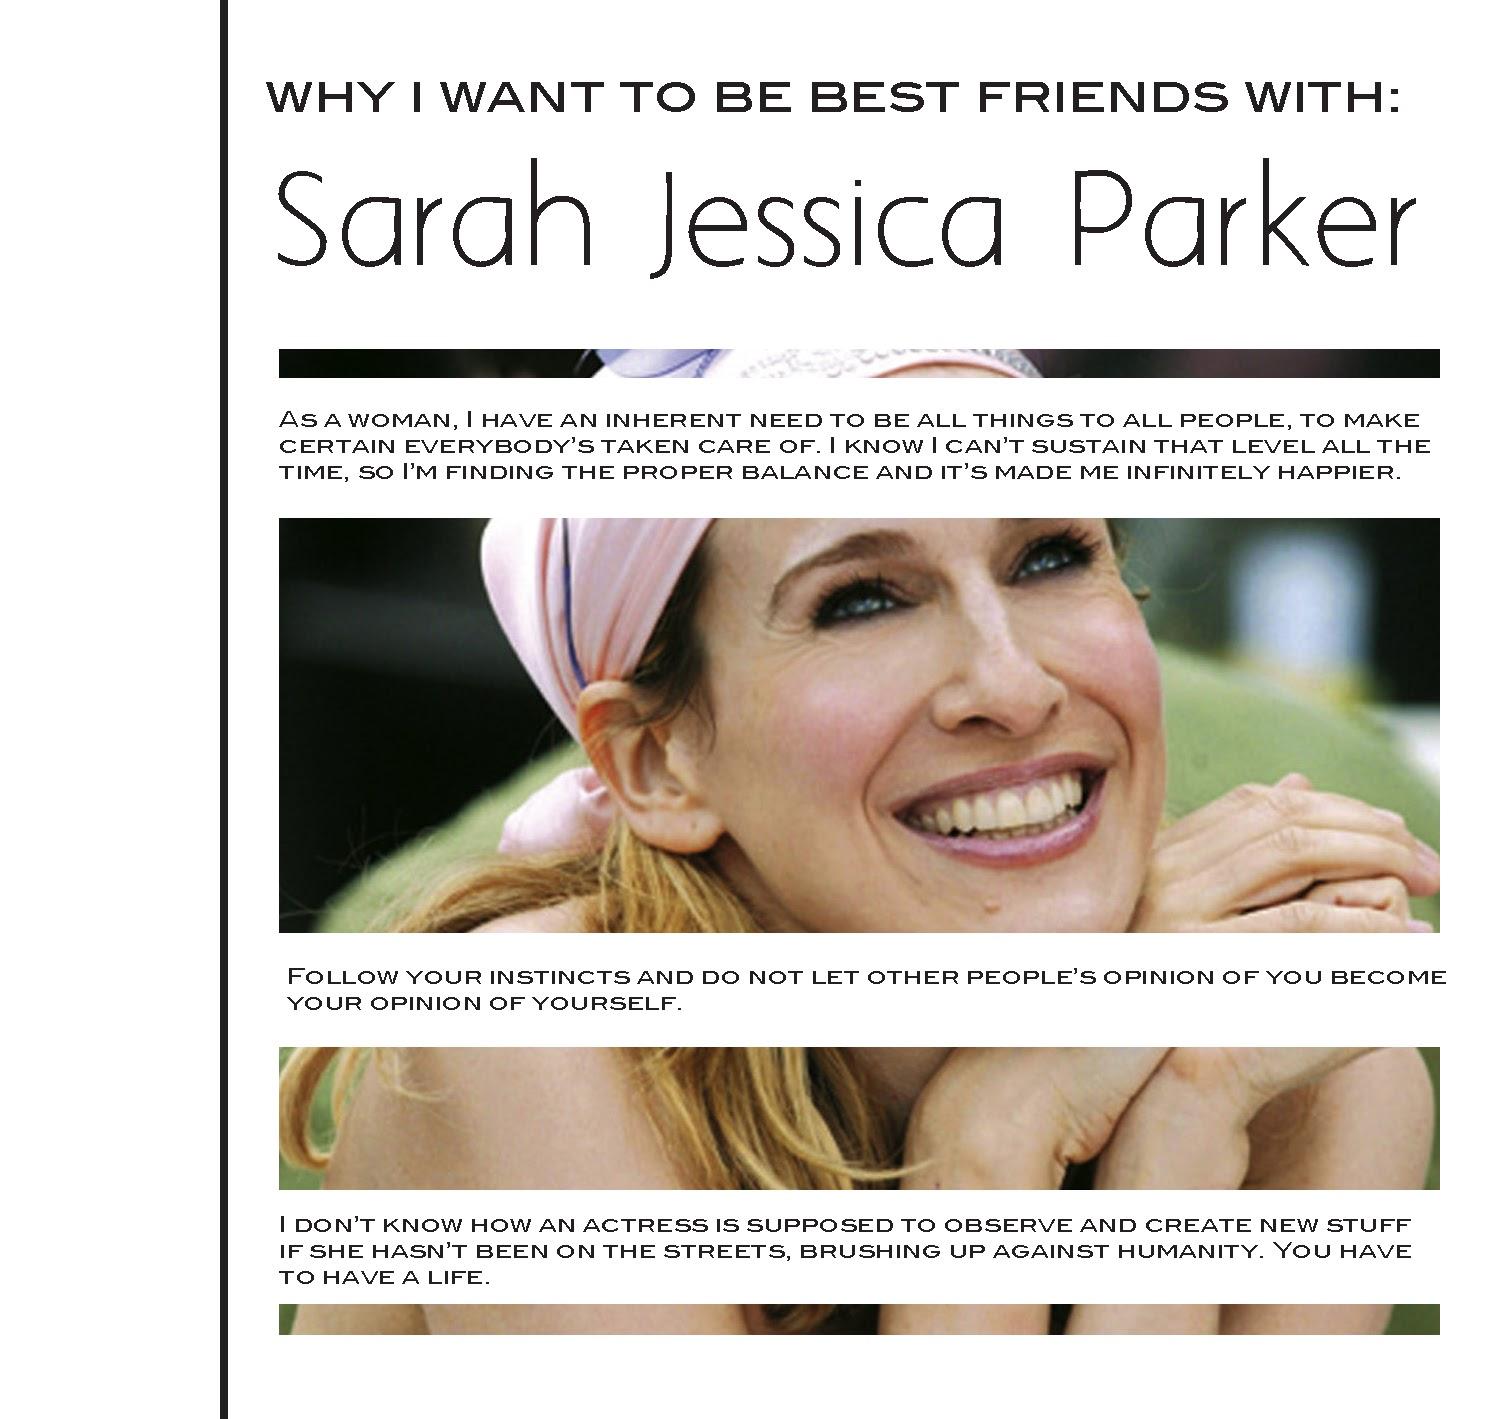 http://2.bp.blogspot.com/-x044BcTSPxc/ULLz4UquMiI/AAAAAAAADiA/cRtsa4kOlro/s1600/Sarah+Jessica+Parker.tiff